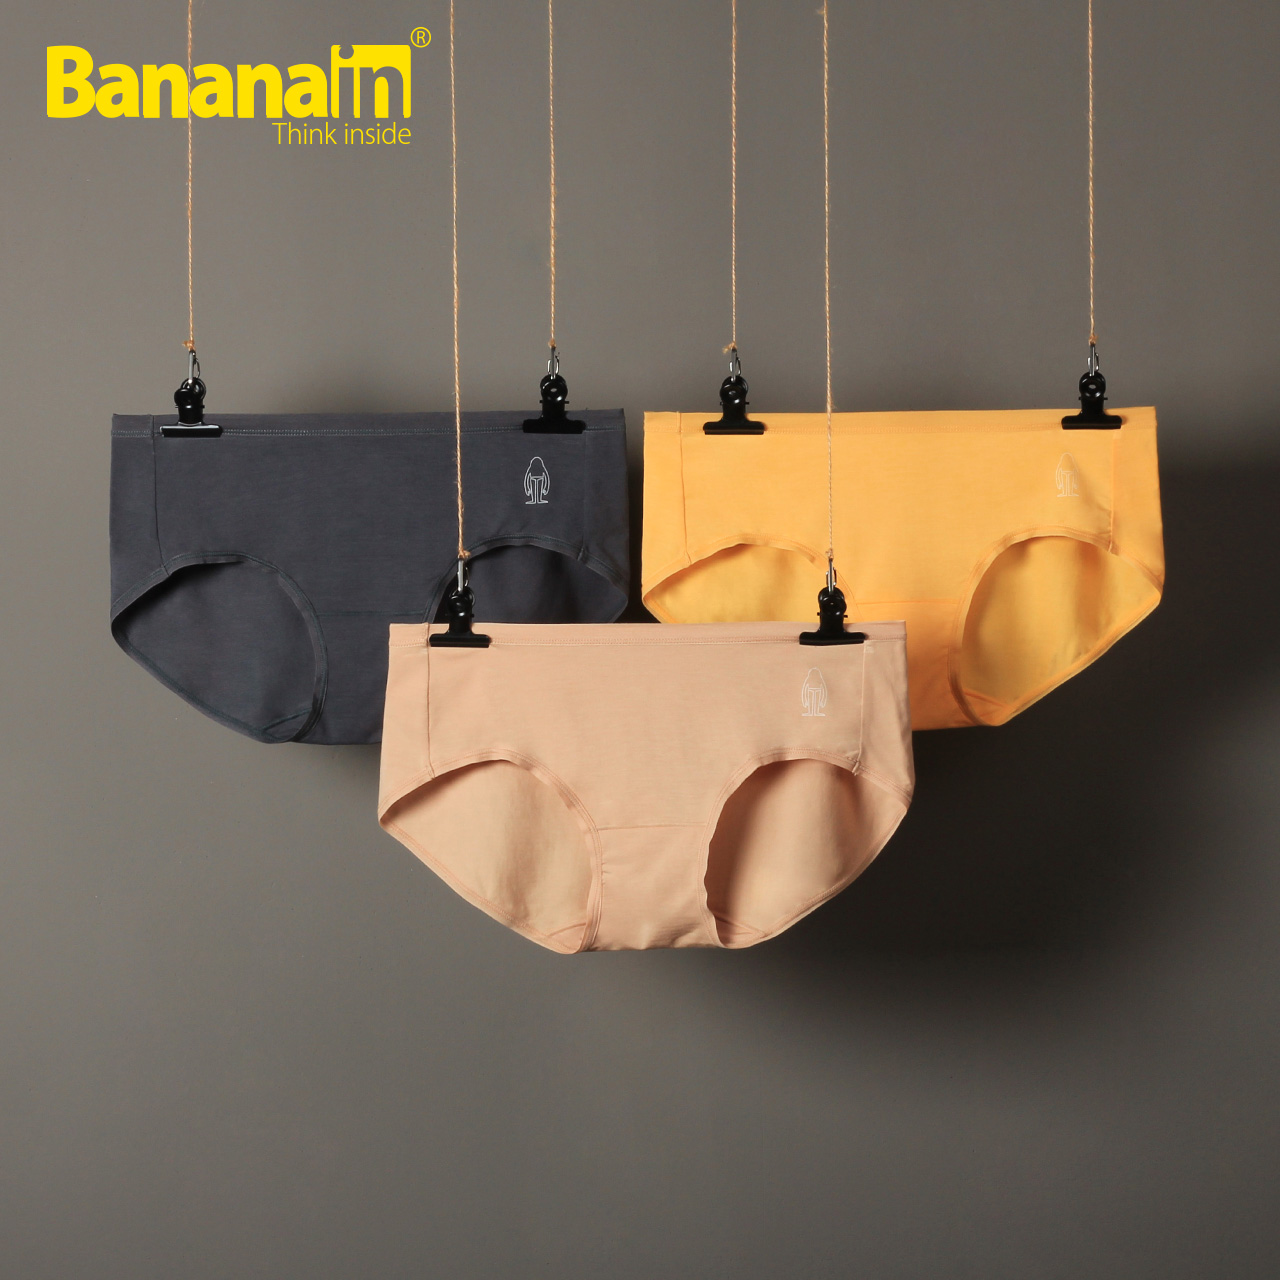 Bananain莫代尔姓感中高腰无痕大码三角裤女士内裤500E3件装蕉纶